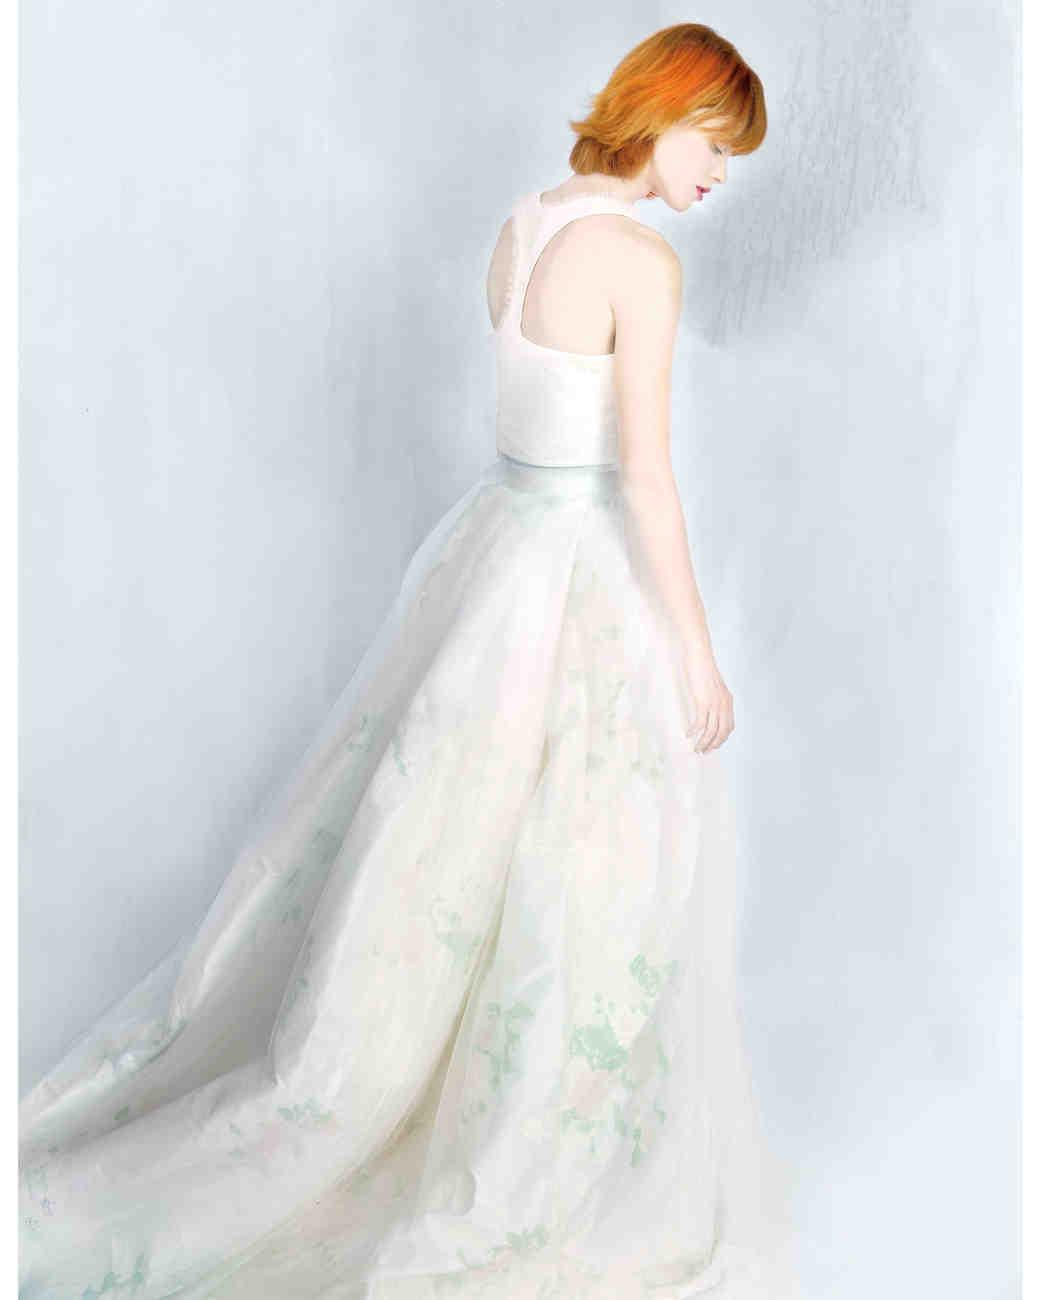 mcarolina-herrara-mia-ball-gown-floral-100-d112700.jpg